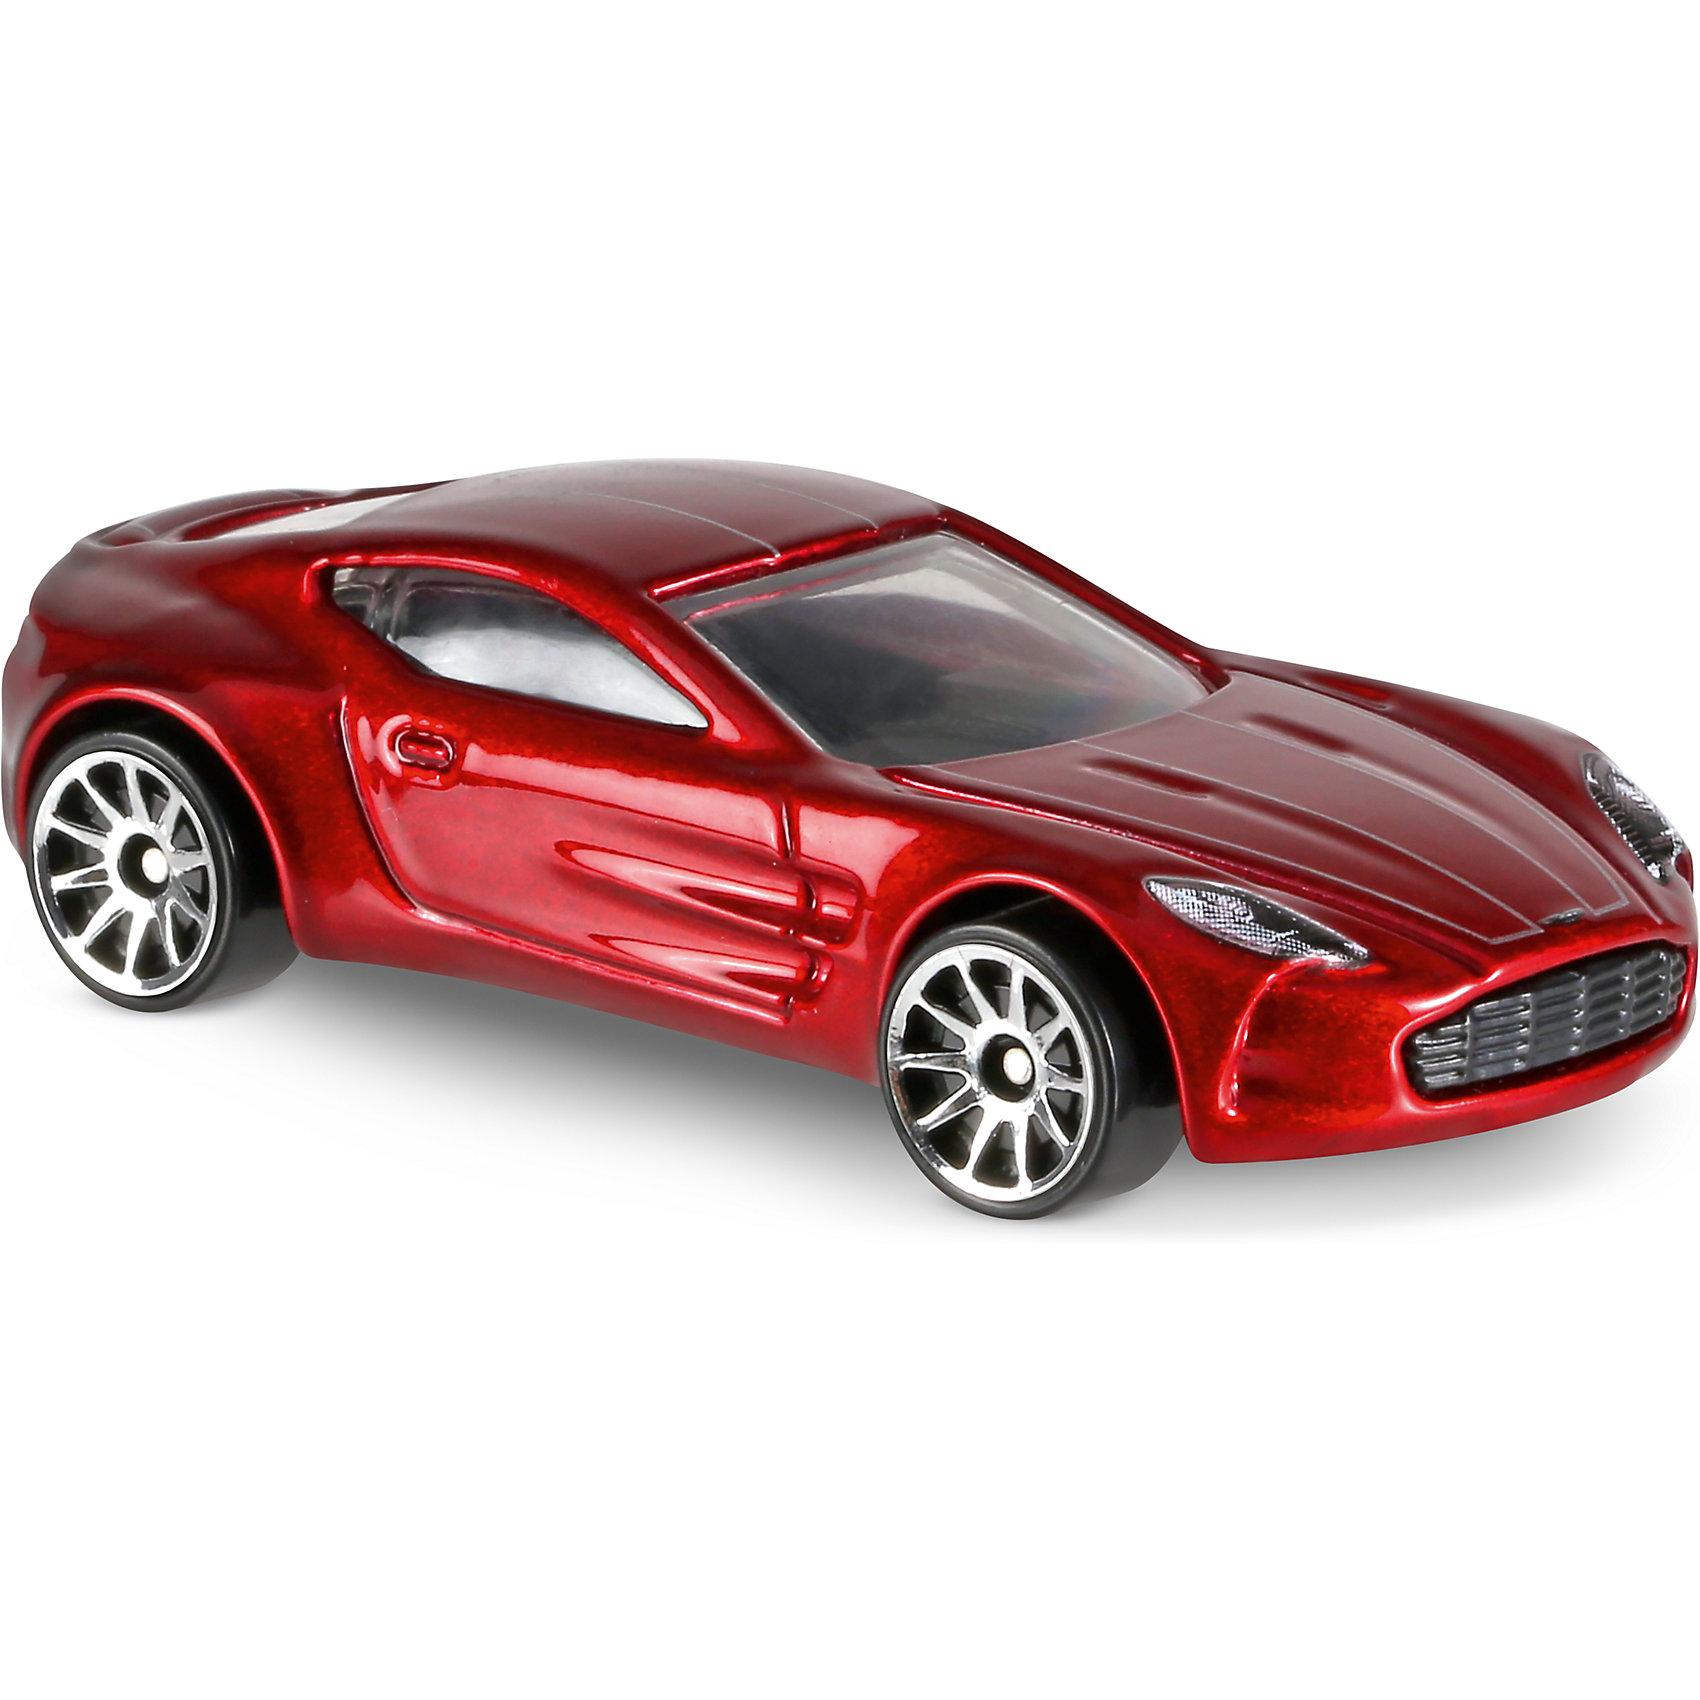 Базовая машинка Hot Wheels, Aston Martin One-77Популярные игрушки<br><br><br>Ширина мм: 110<br>Глубина мм: 45<br>Высота мм: 110<br>Вес г: 30<br>Возраст от месяцев: 36<br>Возраст до месяцев: 96<br>Пол: Мужской<br>Возраст: Детский<br>SKU: 7142085